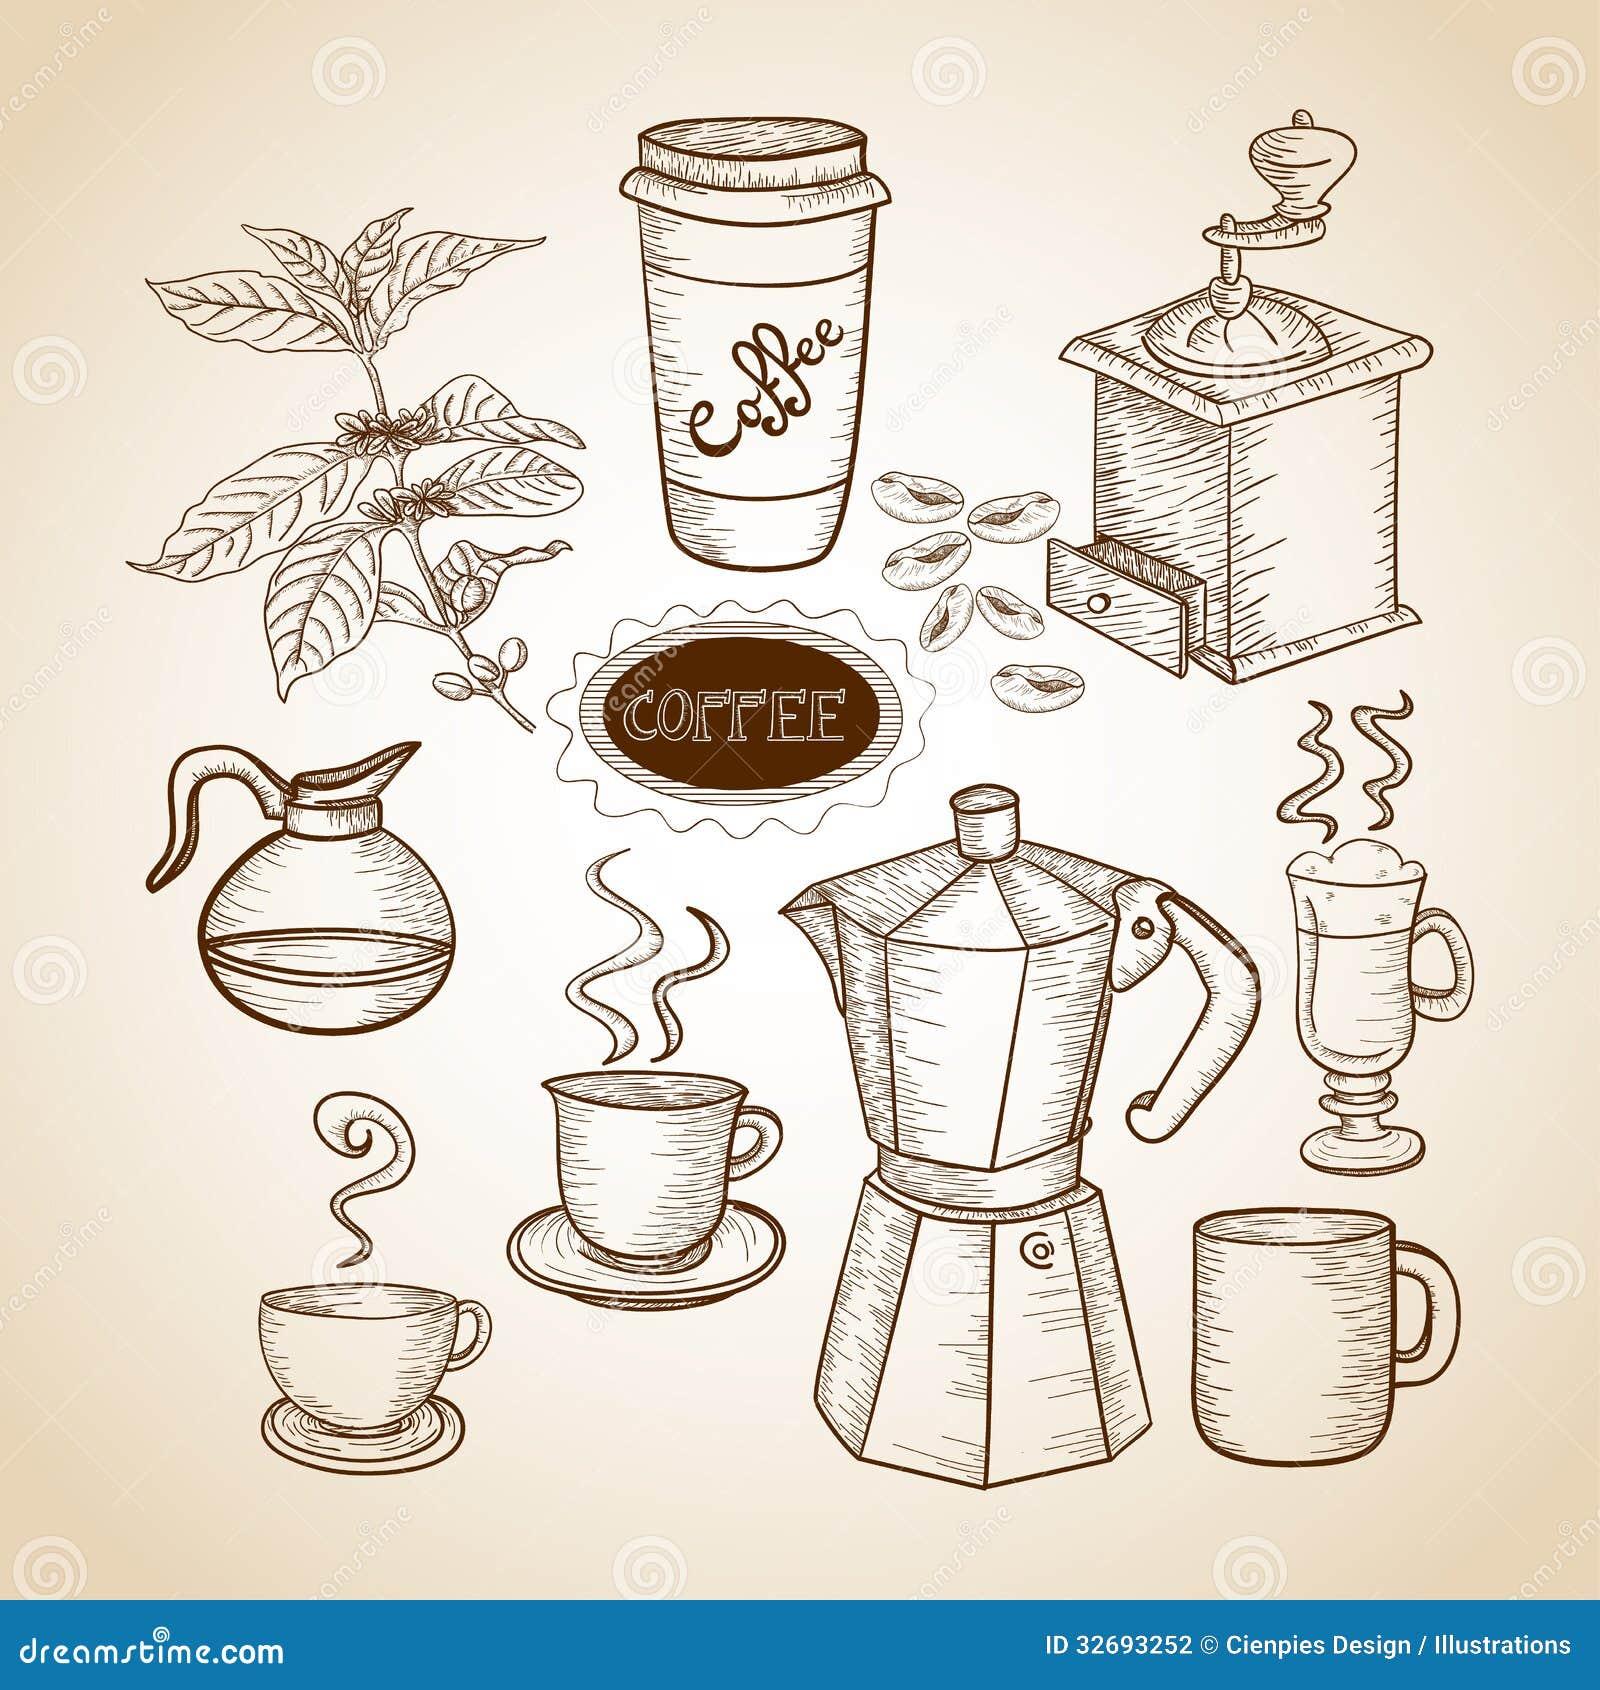 Coffee Mug Drawing Drawing Of A Coffee Mug